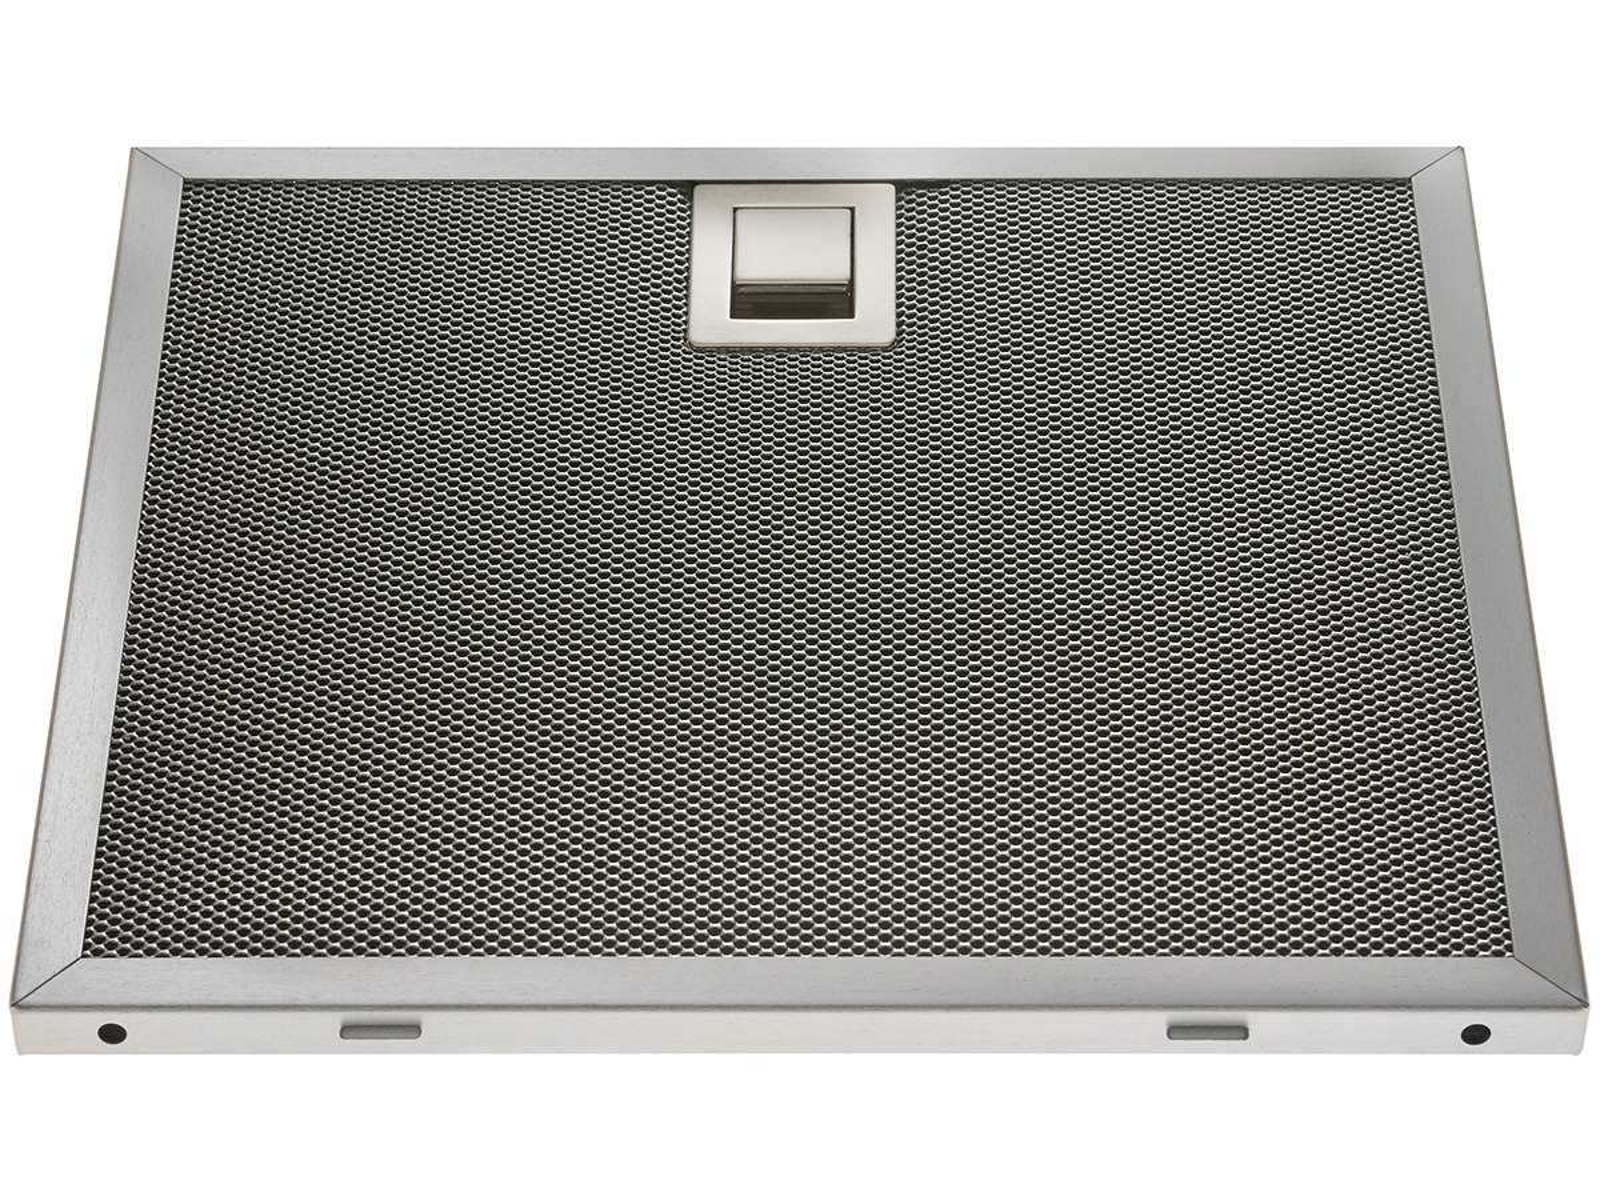 Falmec KACL.920 NRS® Hochleistungs Kohlefilter